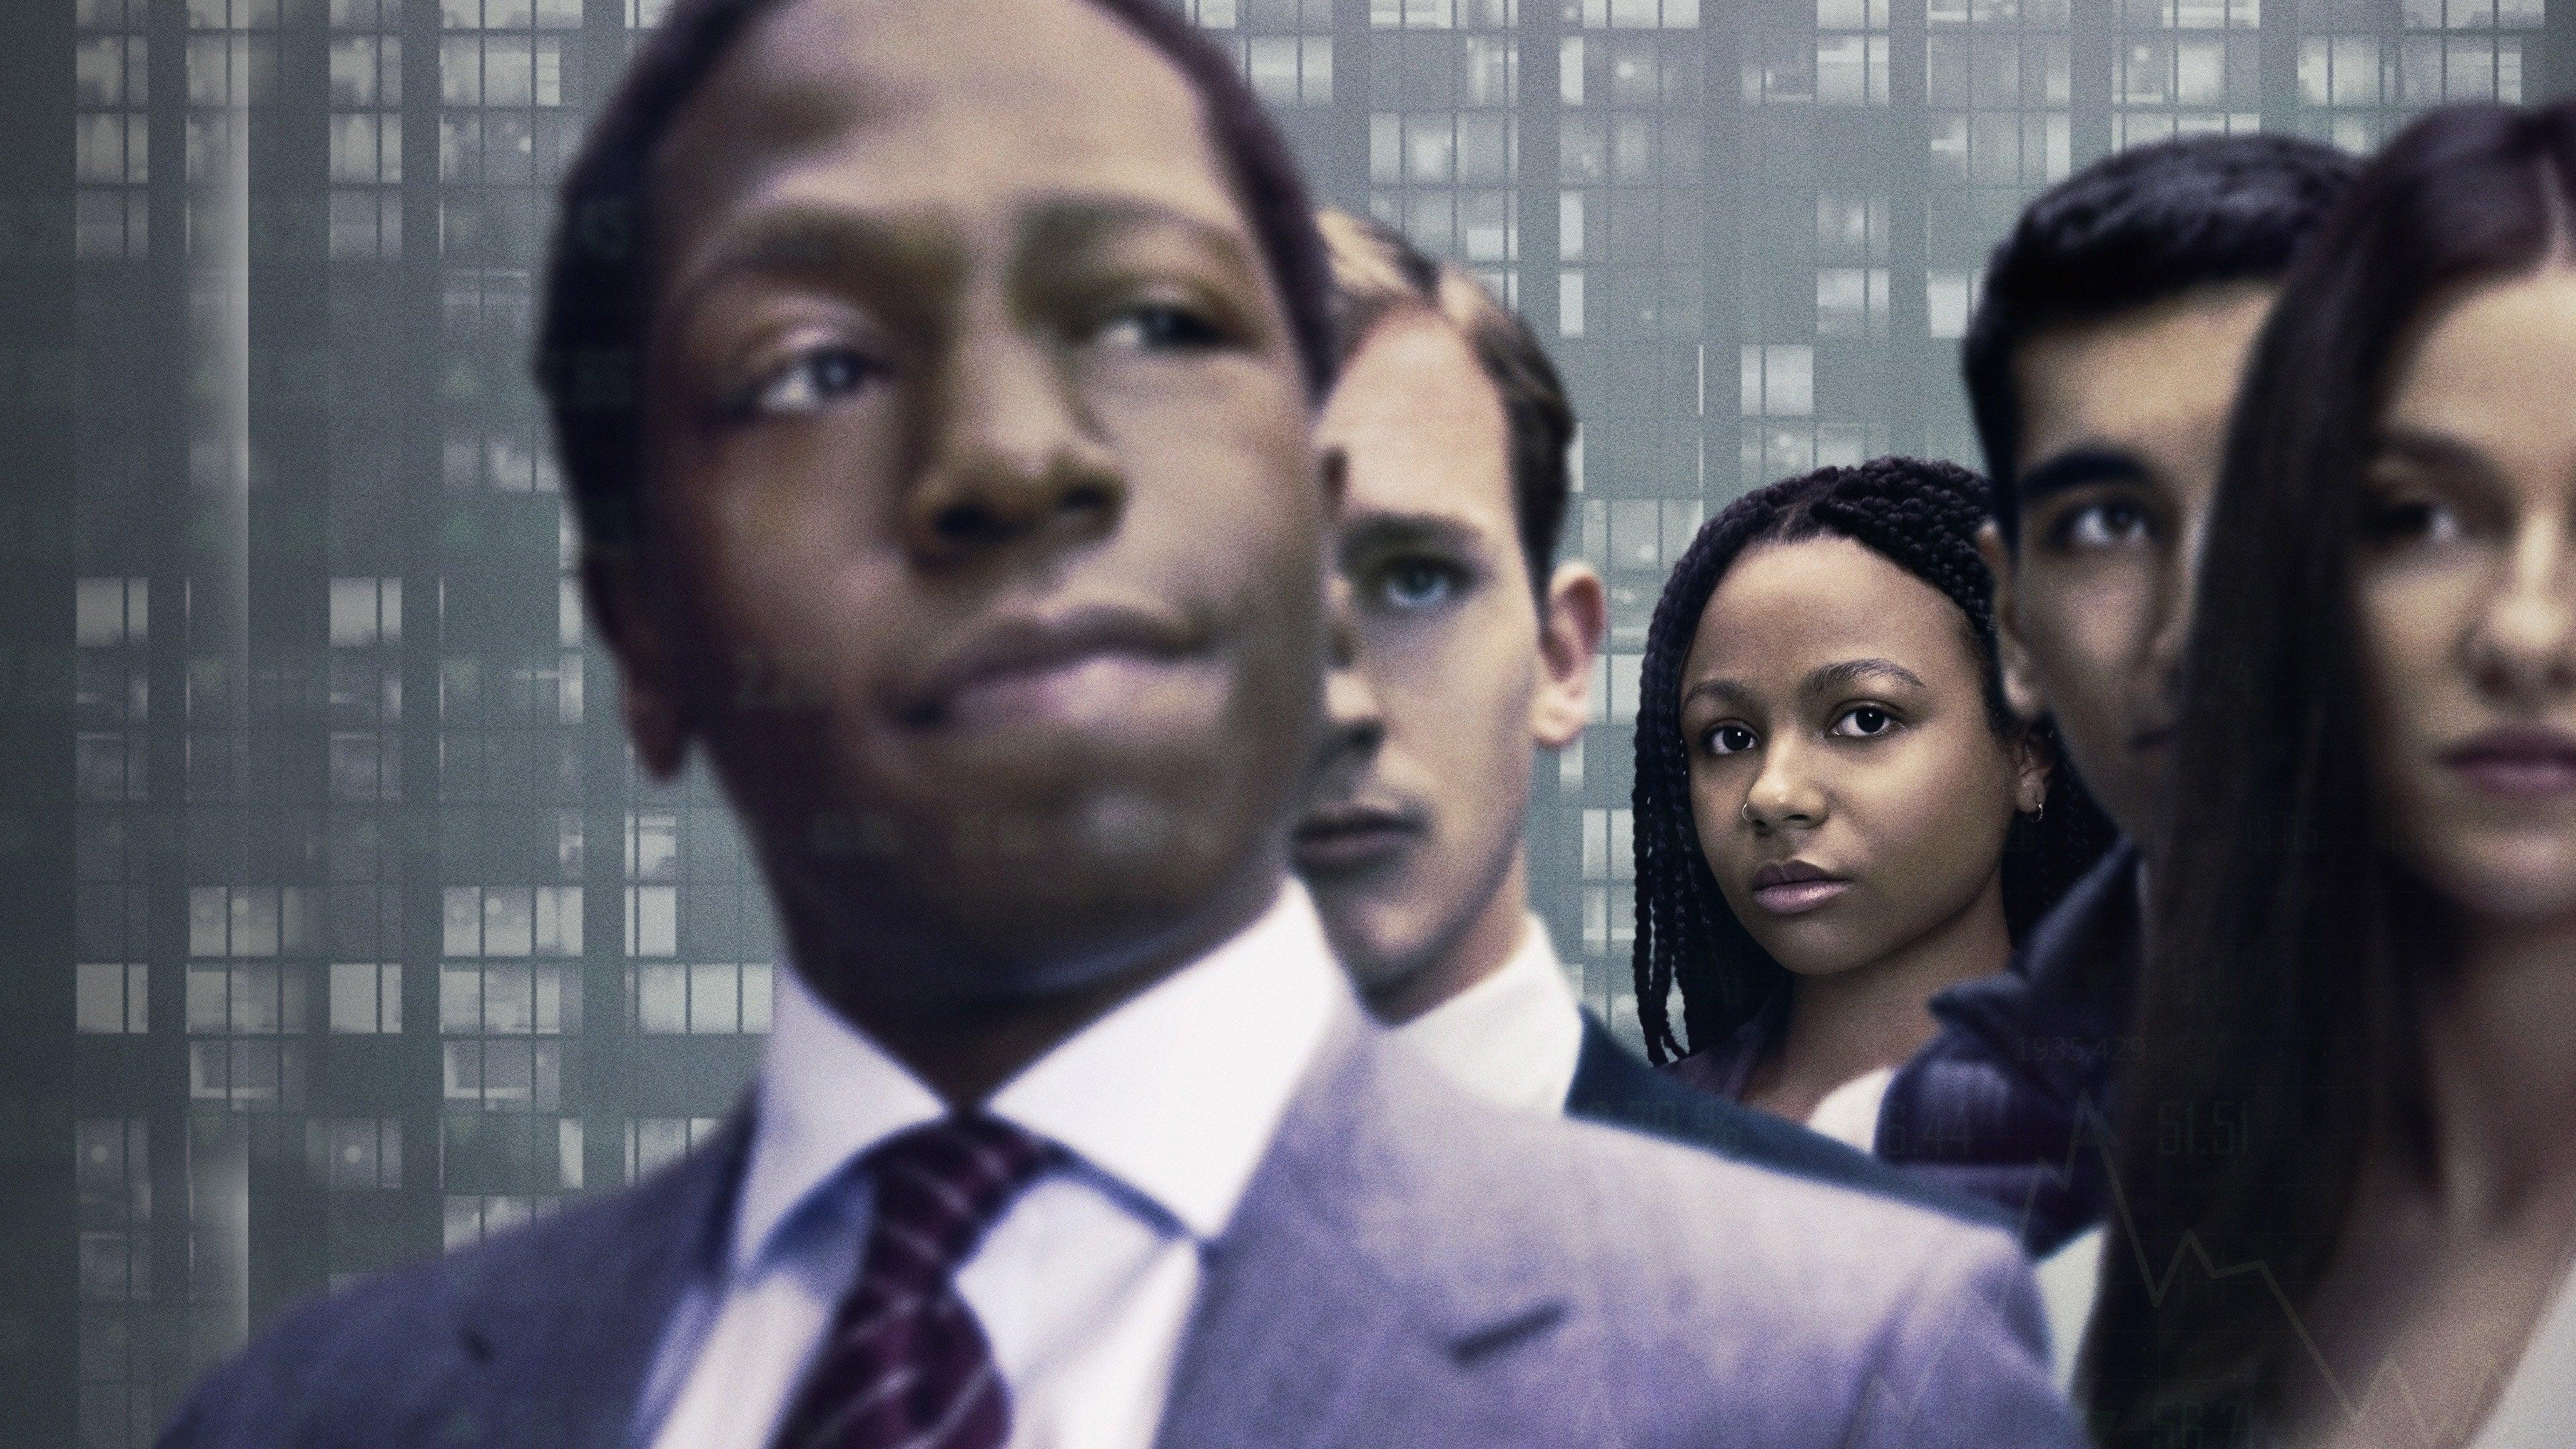 Industry – Temporada 1 Completa [Mega]